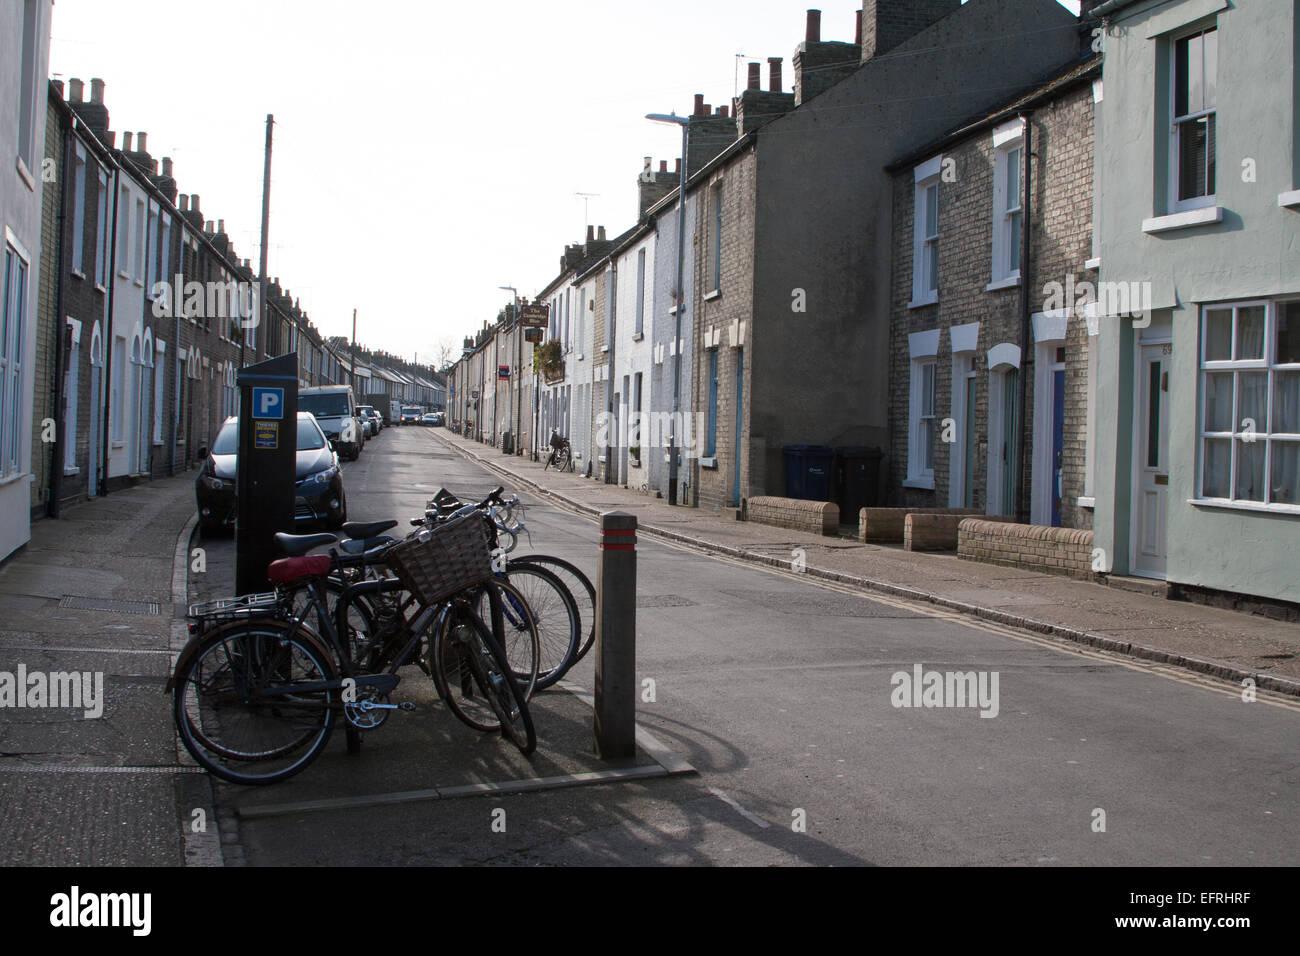 Gwydir Street, Cambridge, UK - Stock Image